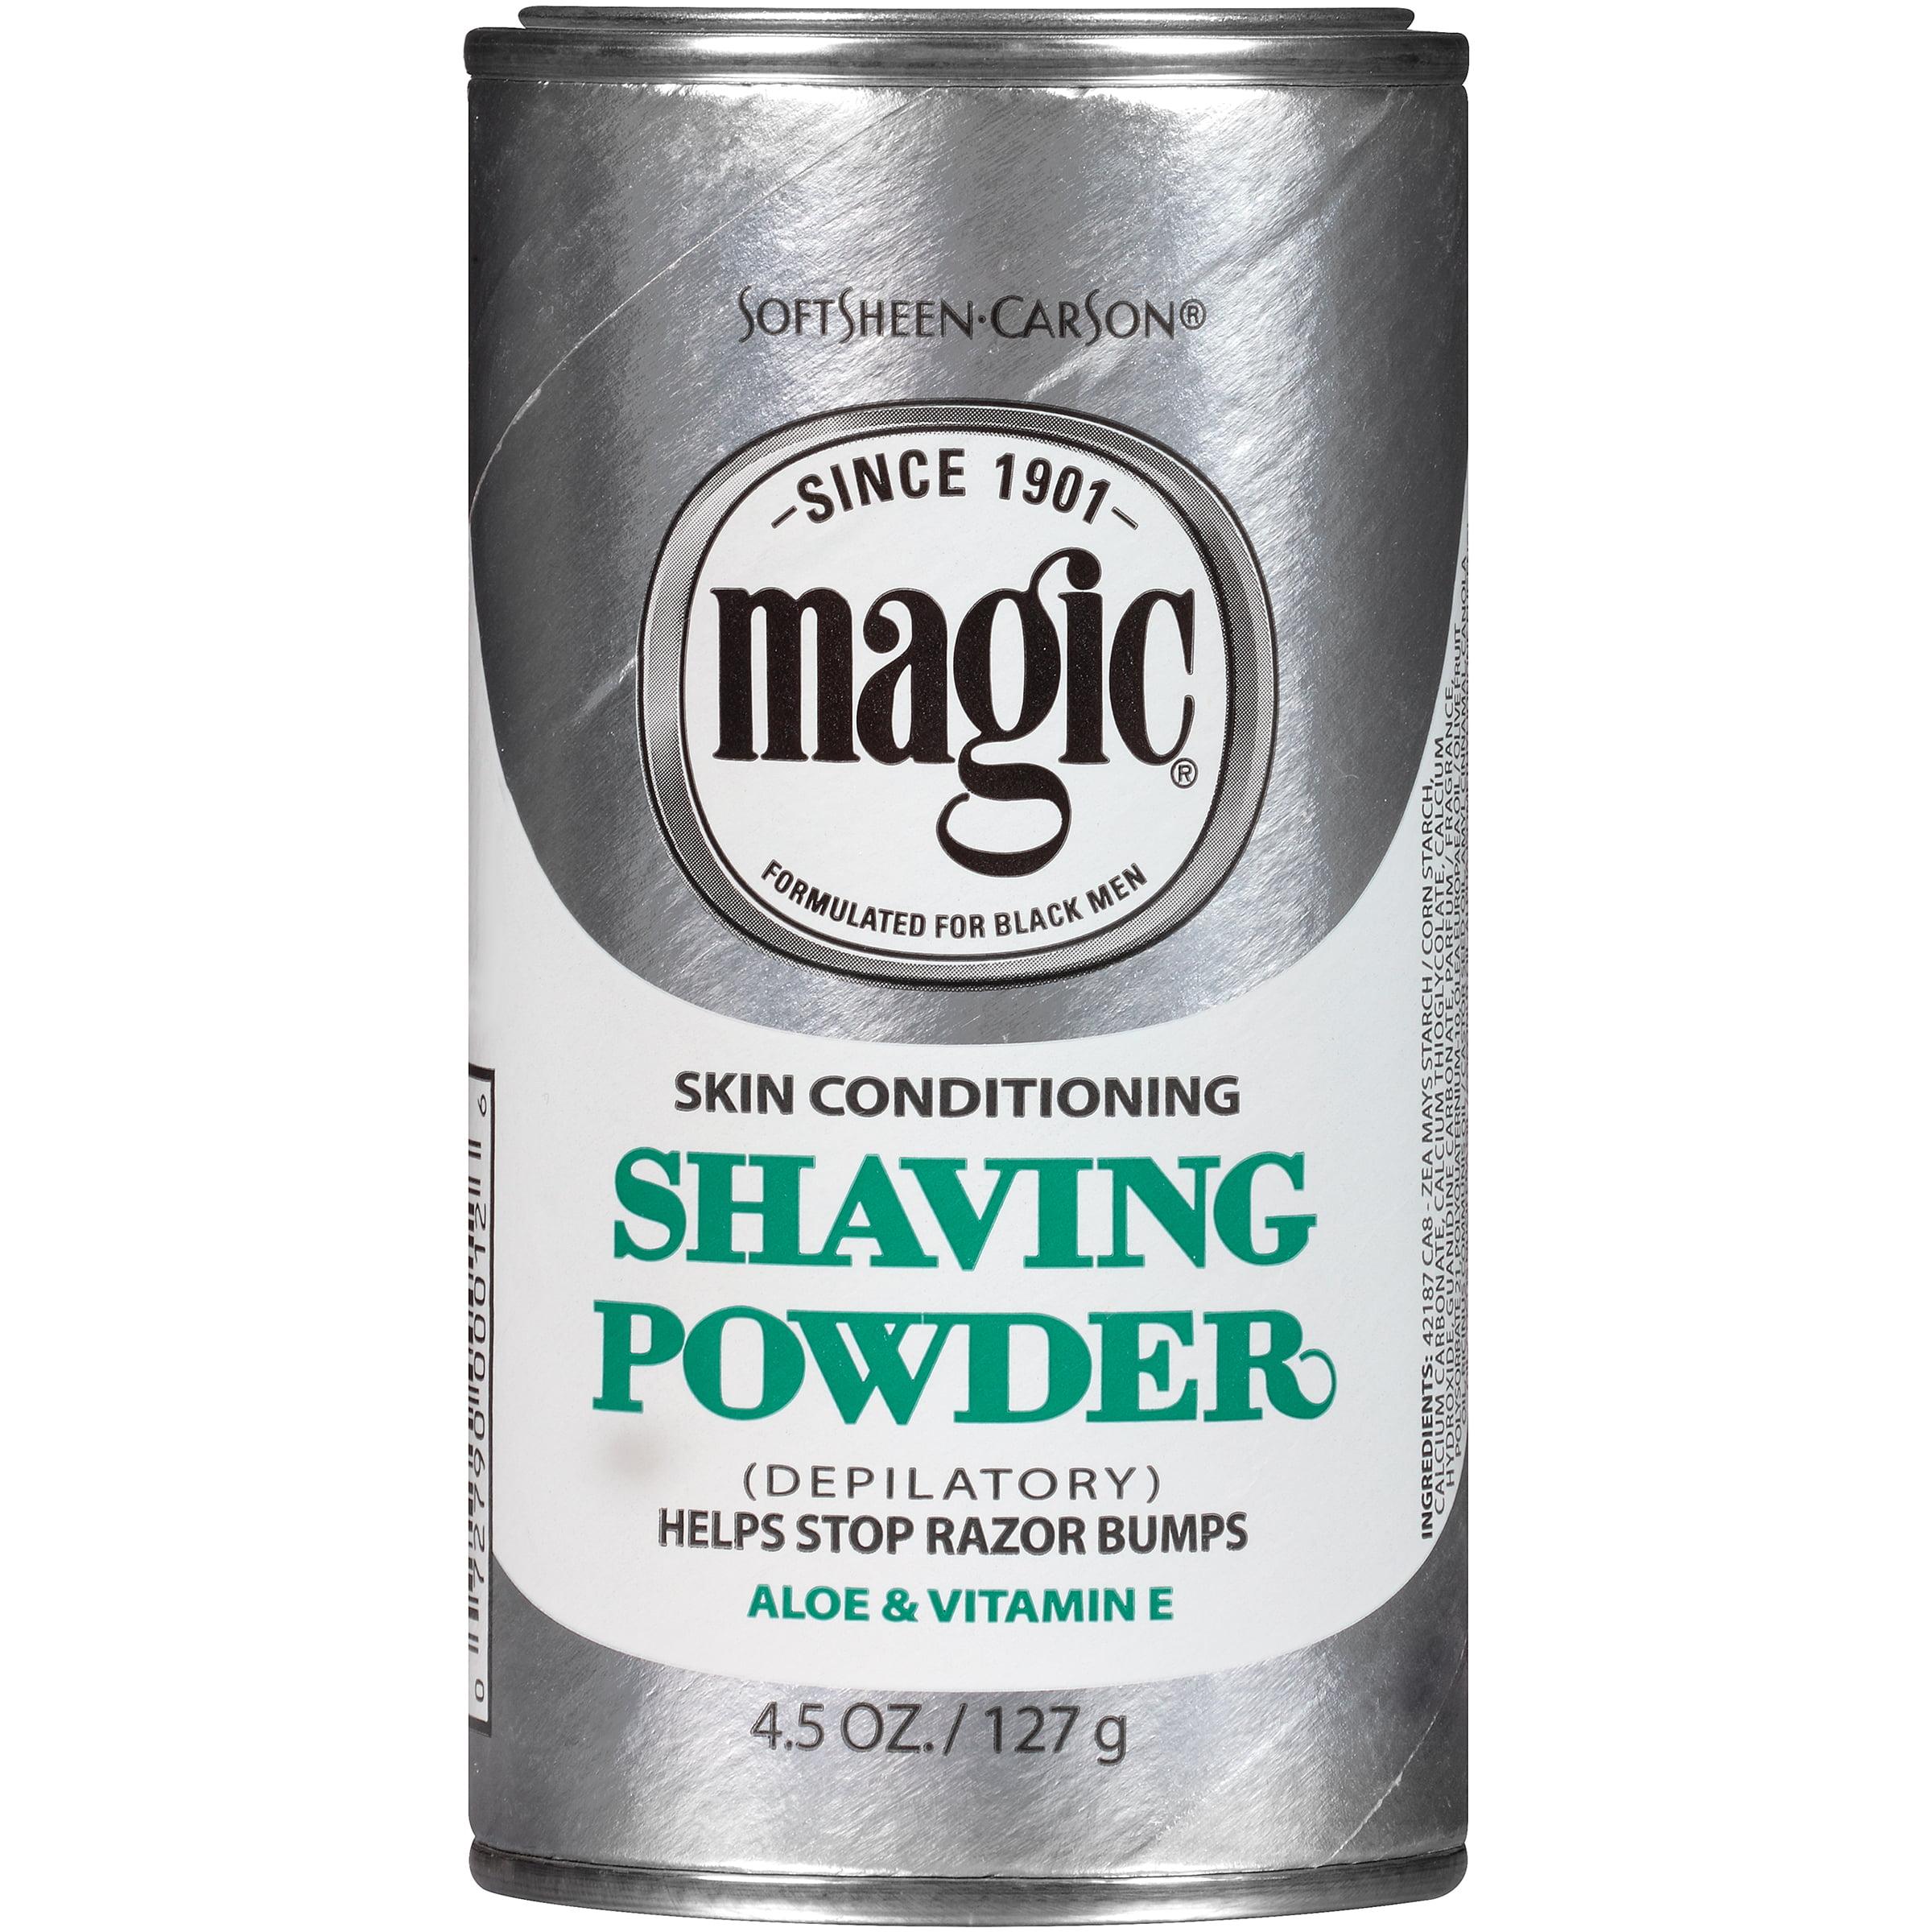 Softsheen Carson Magic Shave Power Skin Conditioning Shaving Powder With Vitamin E And Aloe Depilatory 5 Oz Walmart Com Walmart Com